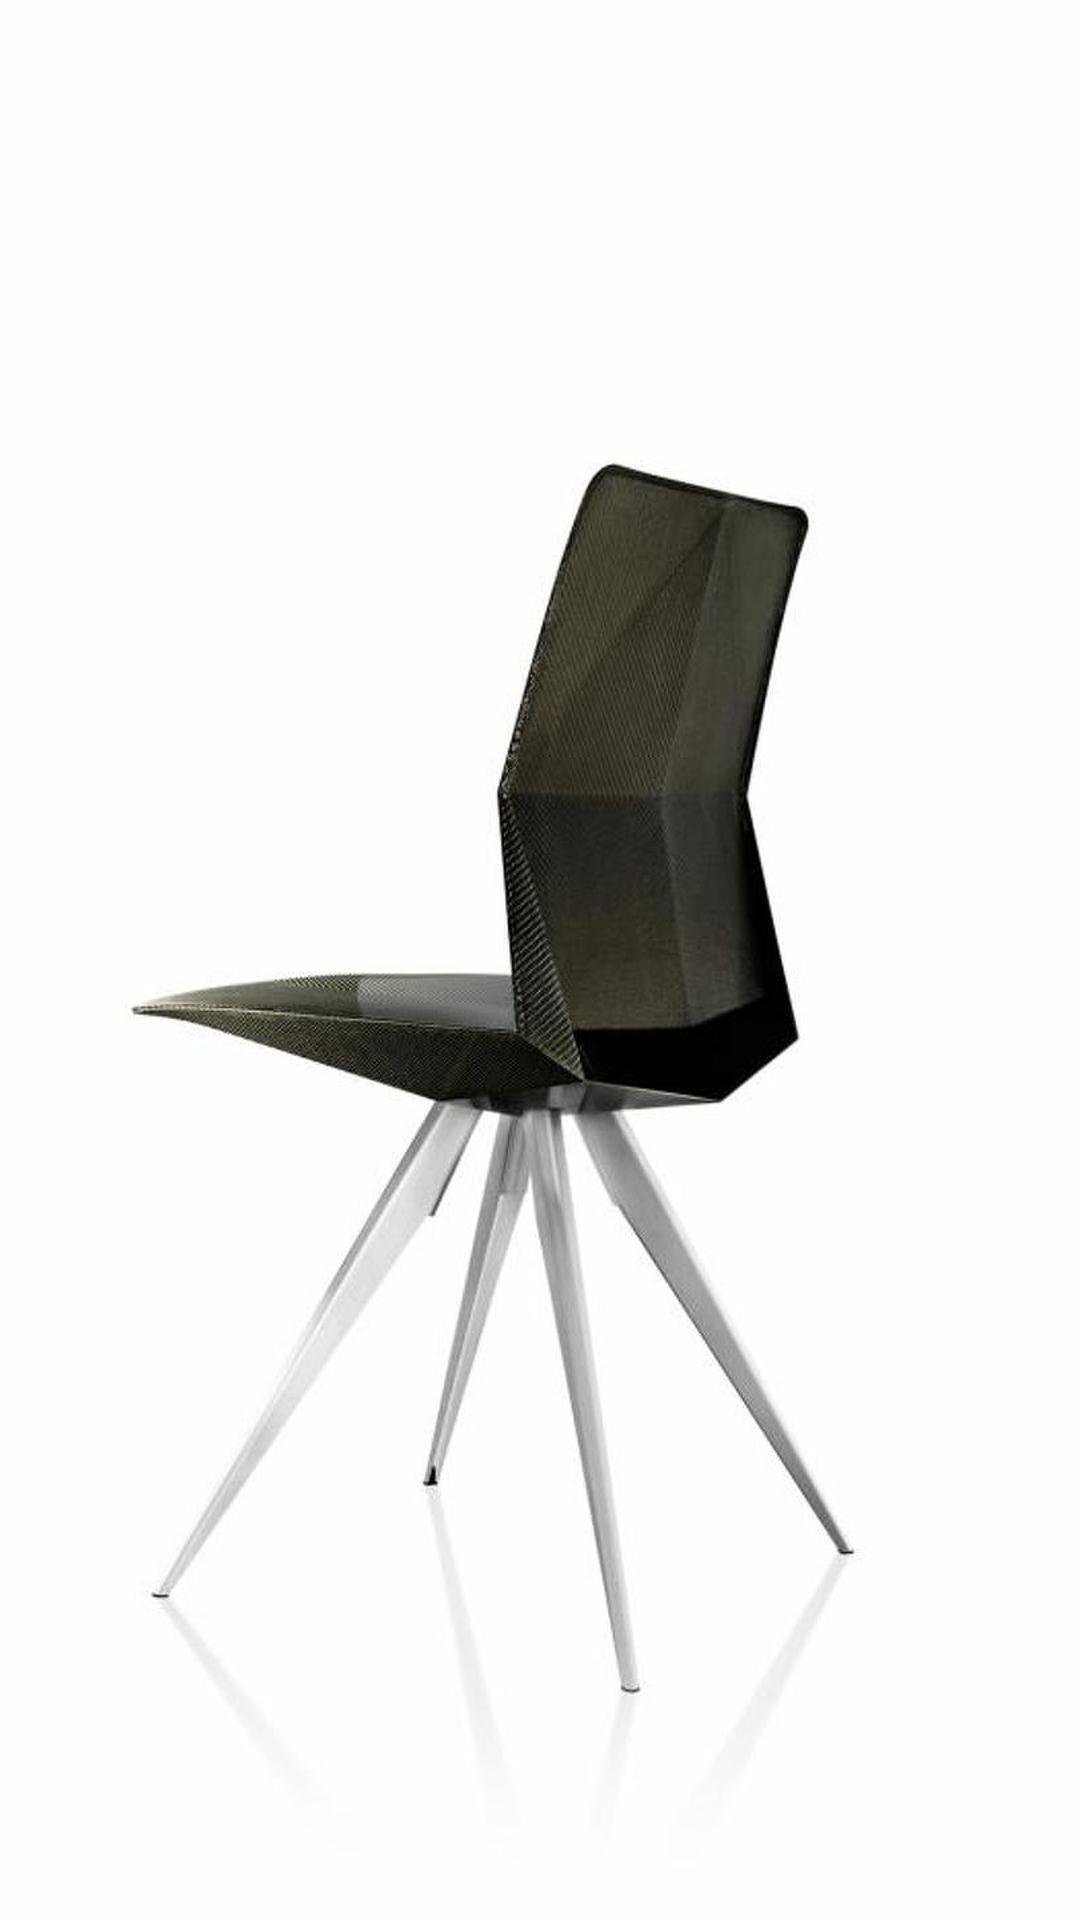 Carbon Fiber Chair Audi Launches Lightweight Carbon Fiber And Aluminum R18 Ultra Chair